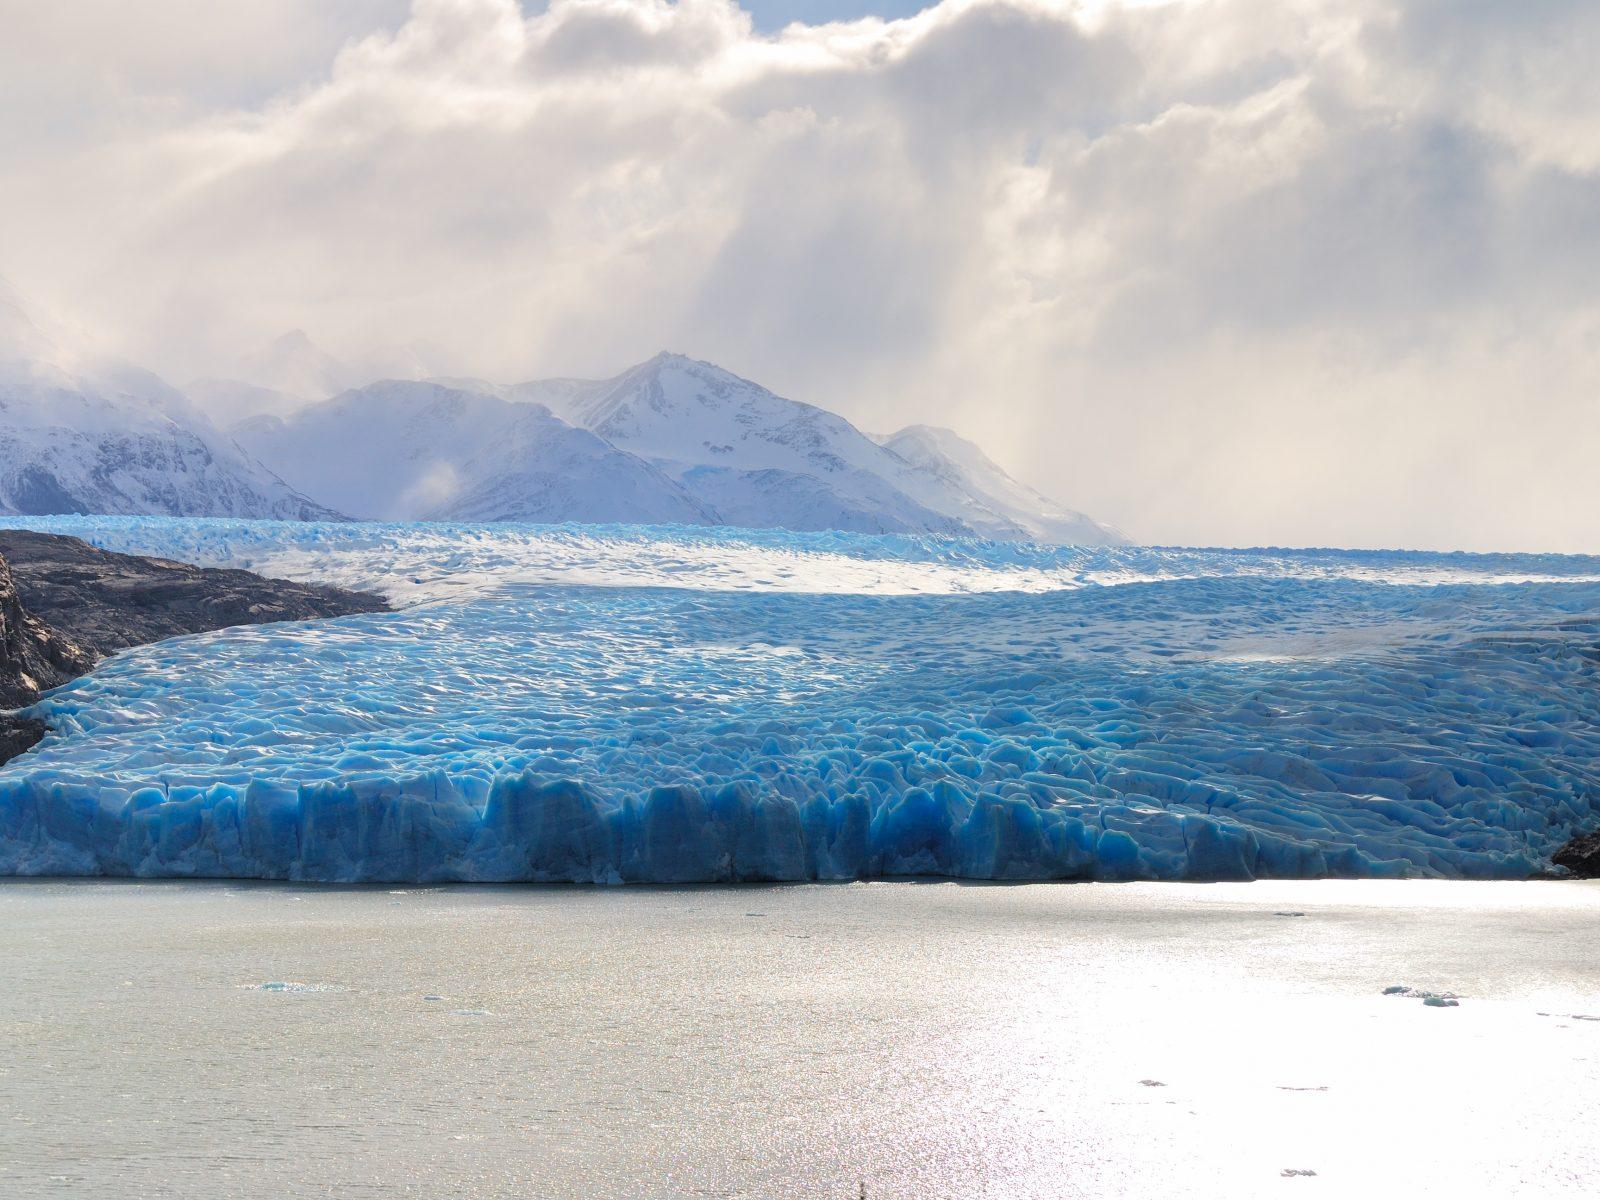 Blue Glacier Wallpaper 4k Hd Wallpaper Background